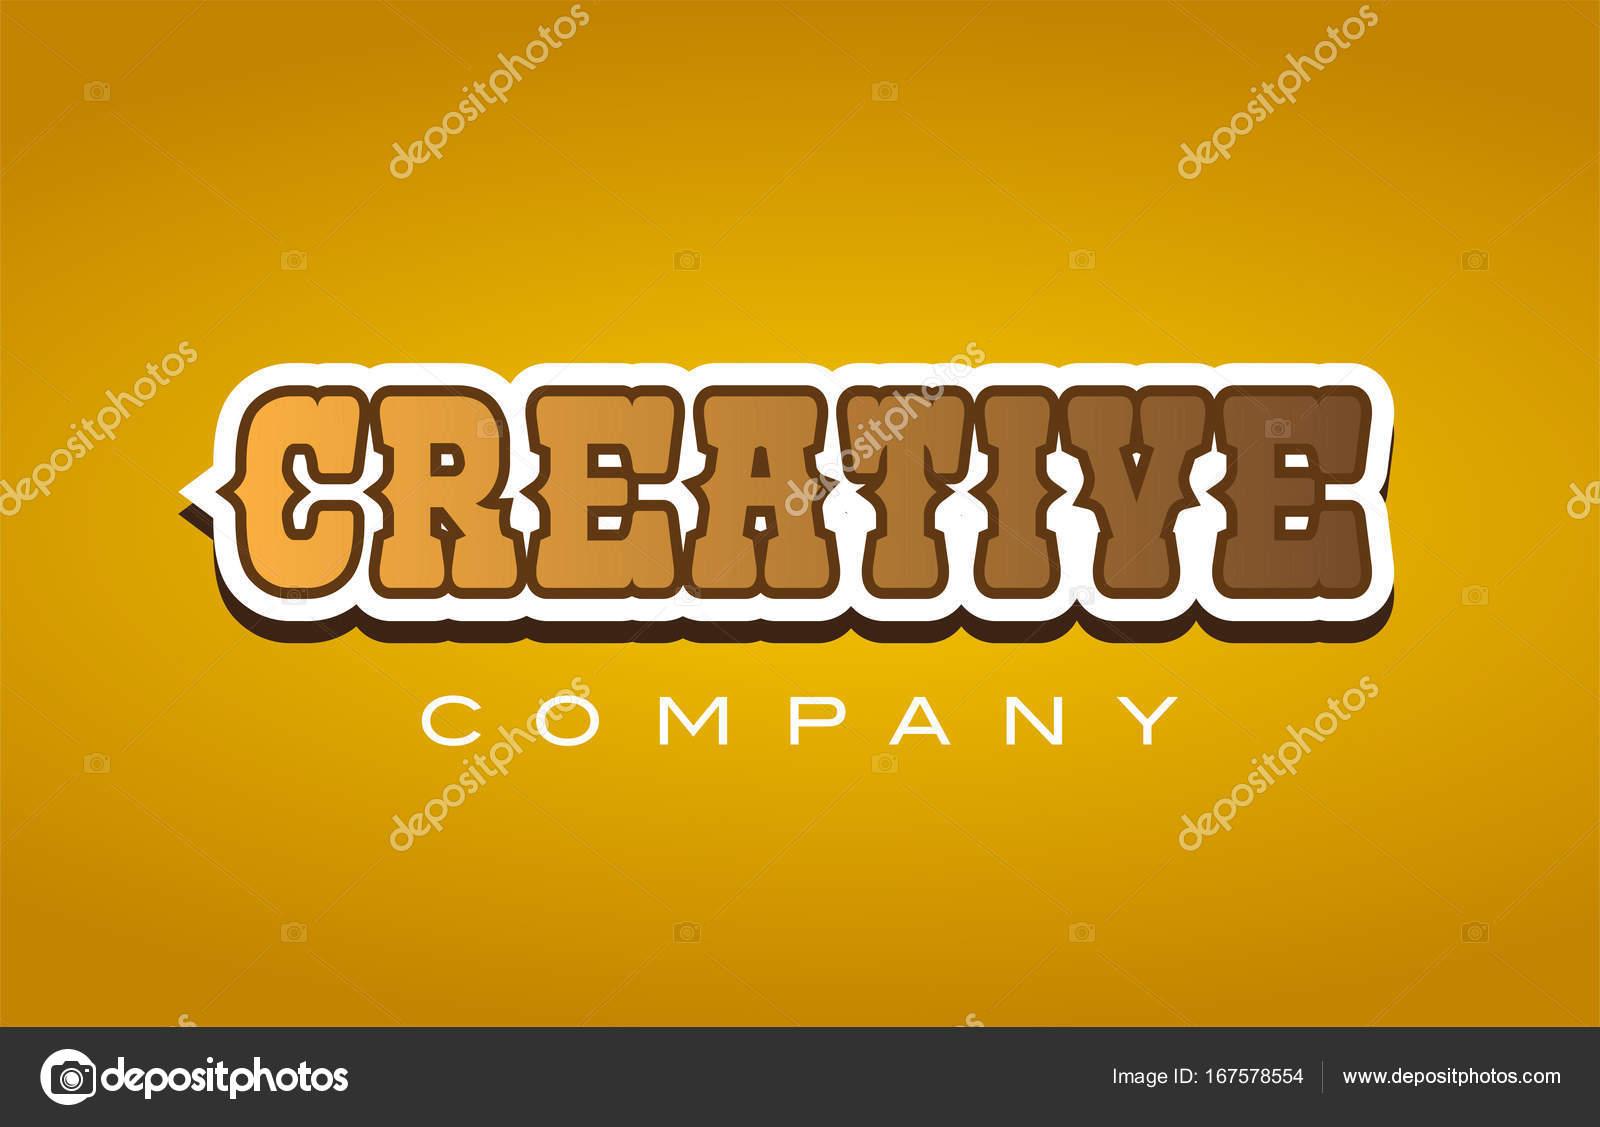 creative western style word text logo design icon company \u2014 Stock